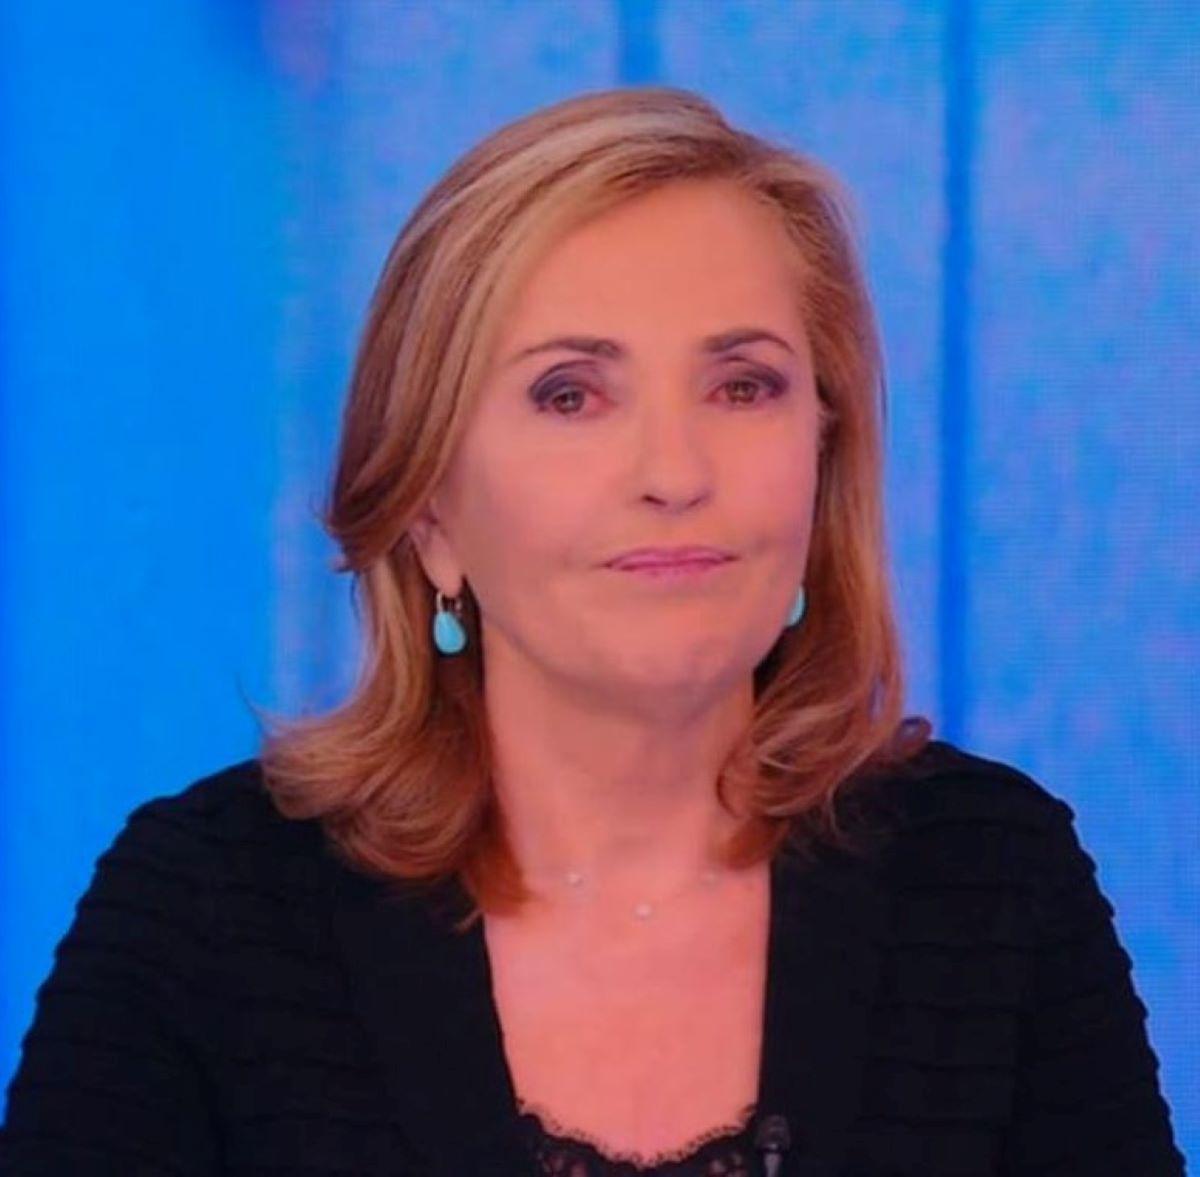 Barbara Palombelli Lacrime Stasera Italia Morte Camilla Canepa